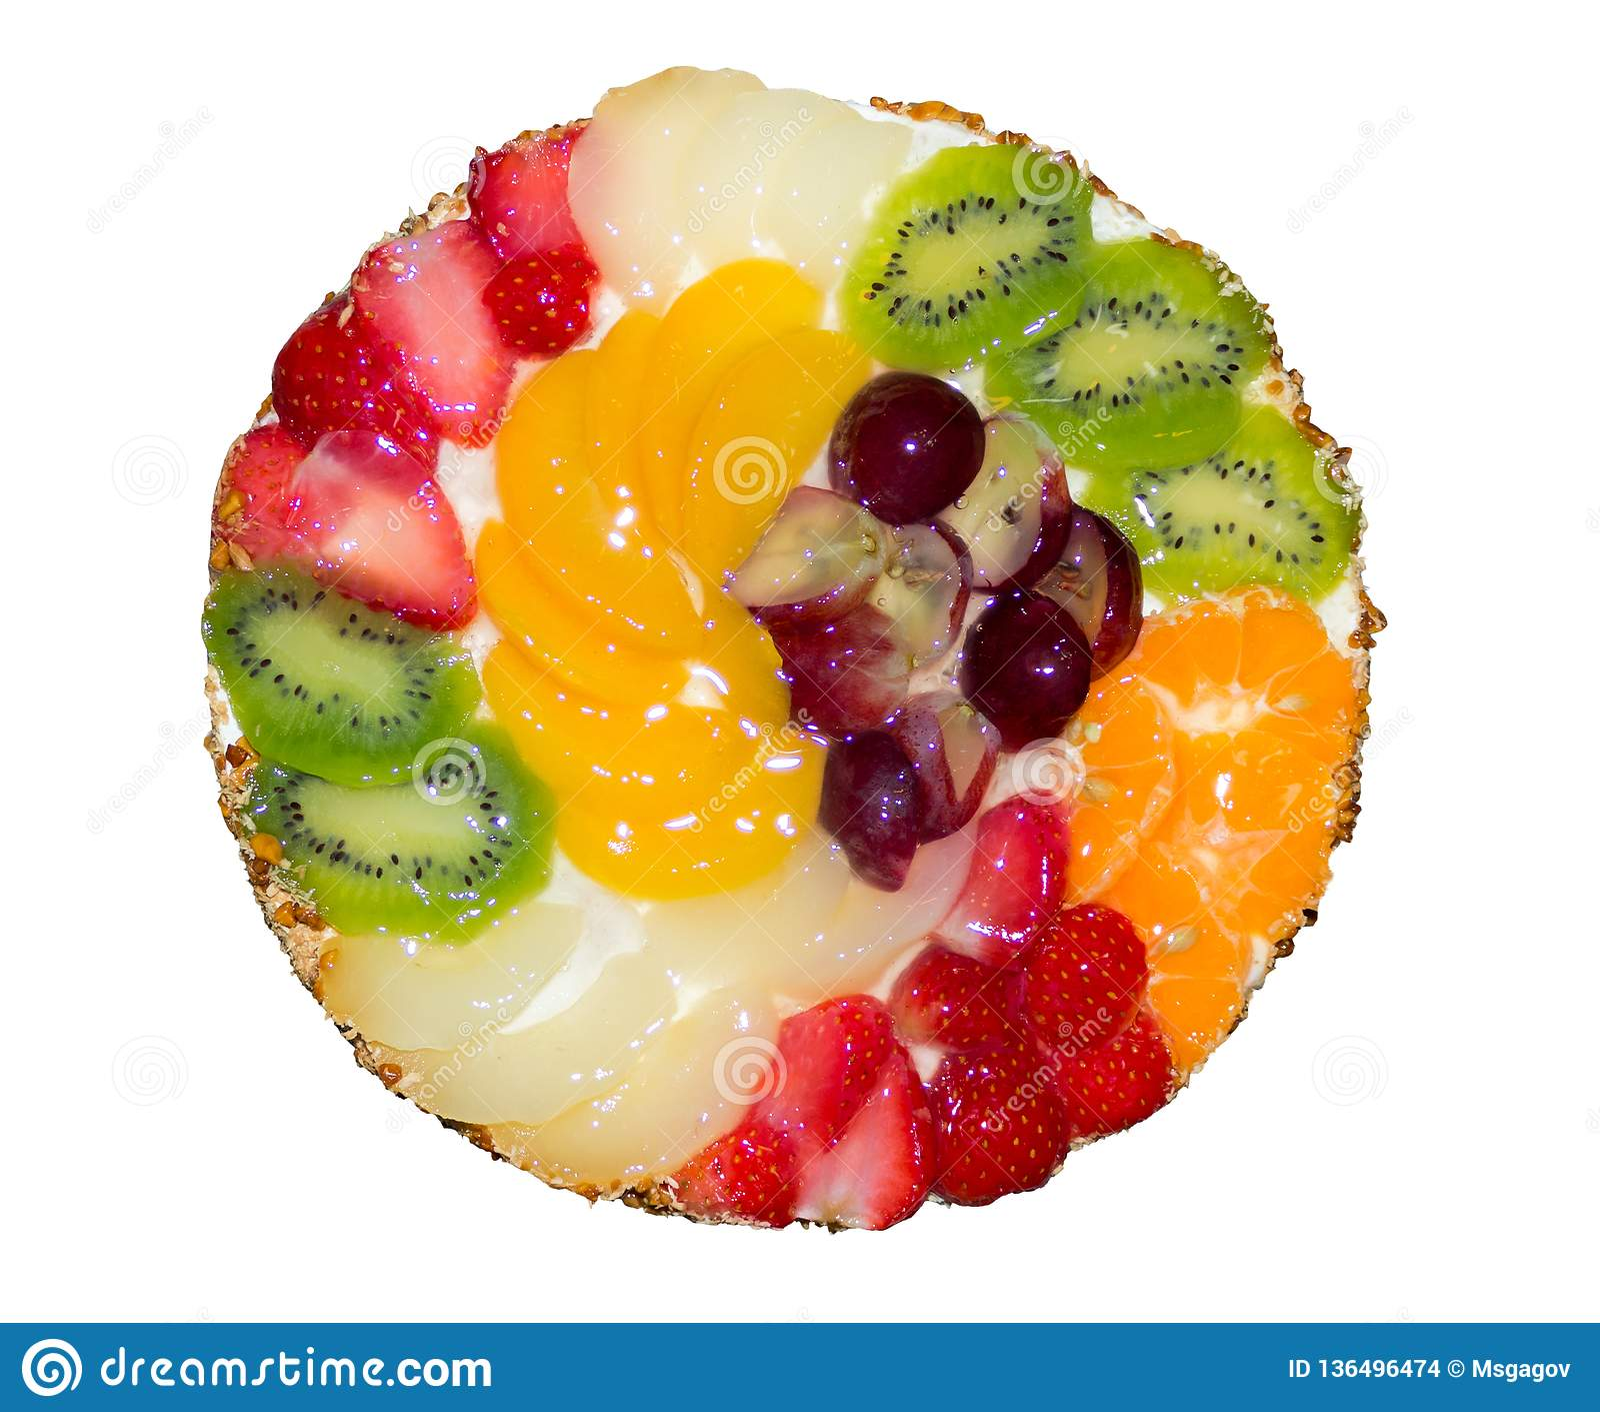 Strange Birthday Fruit Cake Stock Photo Image Of Birthday Kiwi 136496474 Funny Birthday Cards Online Fluifree Goldxyz